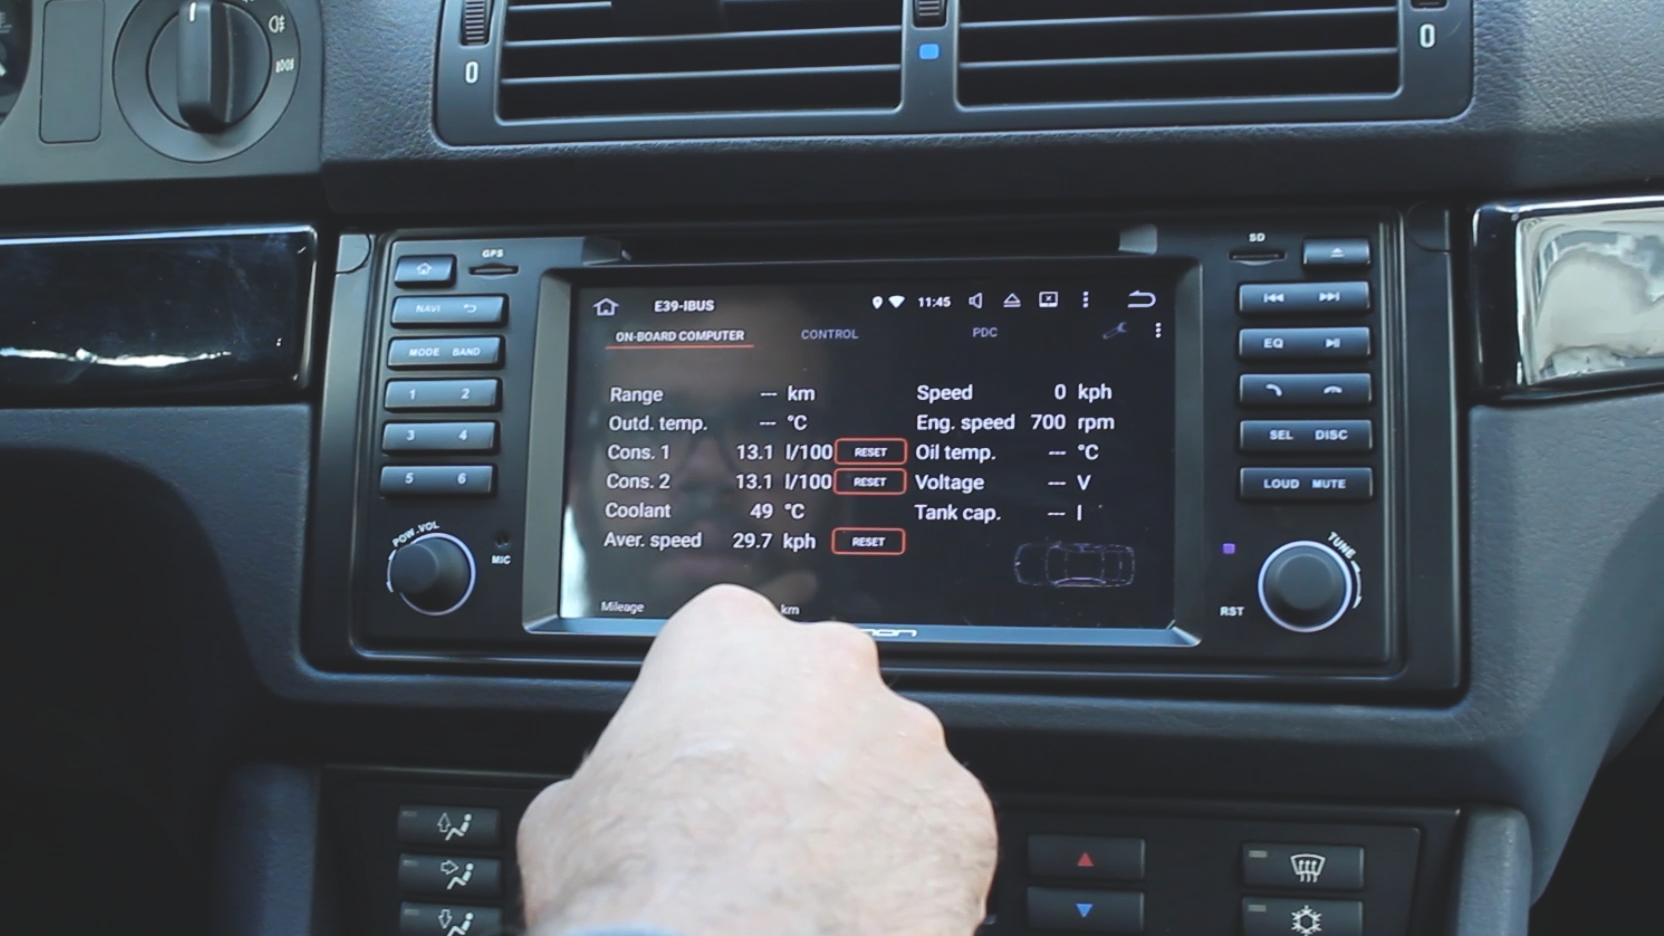 MÖmus BMW E39 Android Navigation Install Board Computer App.jpg